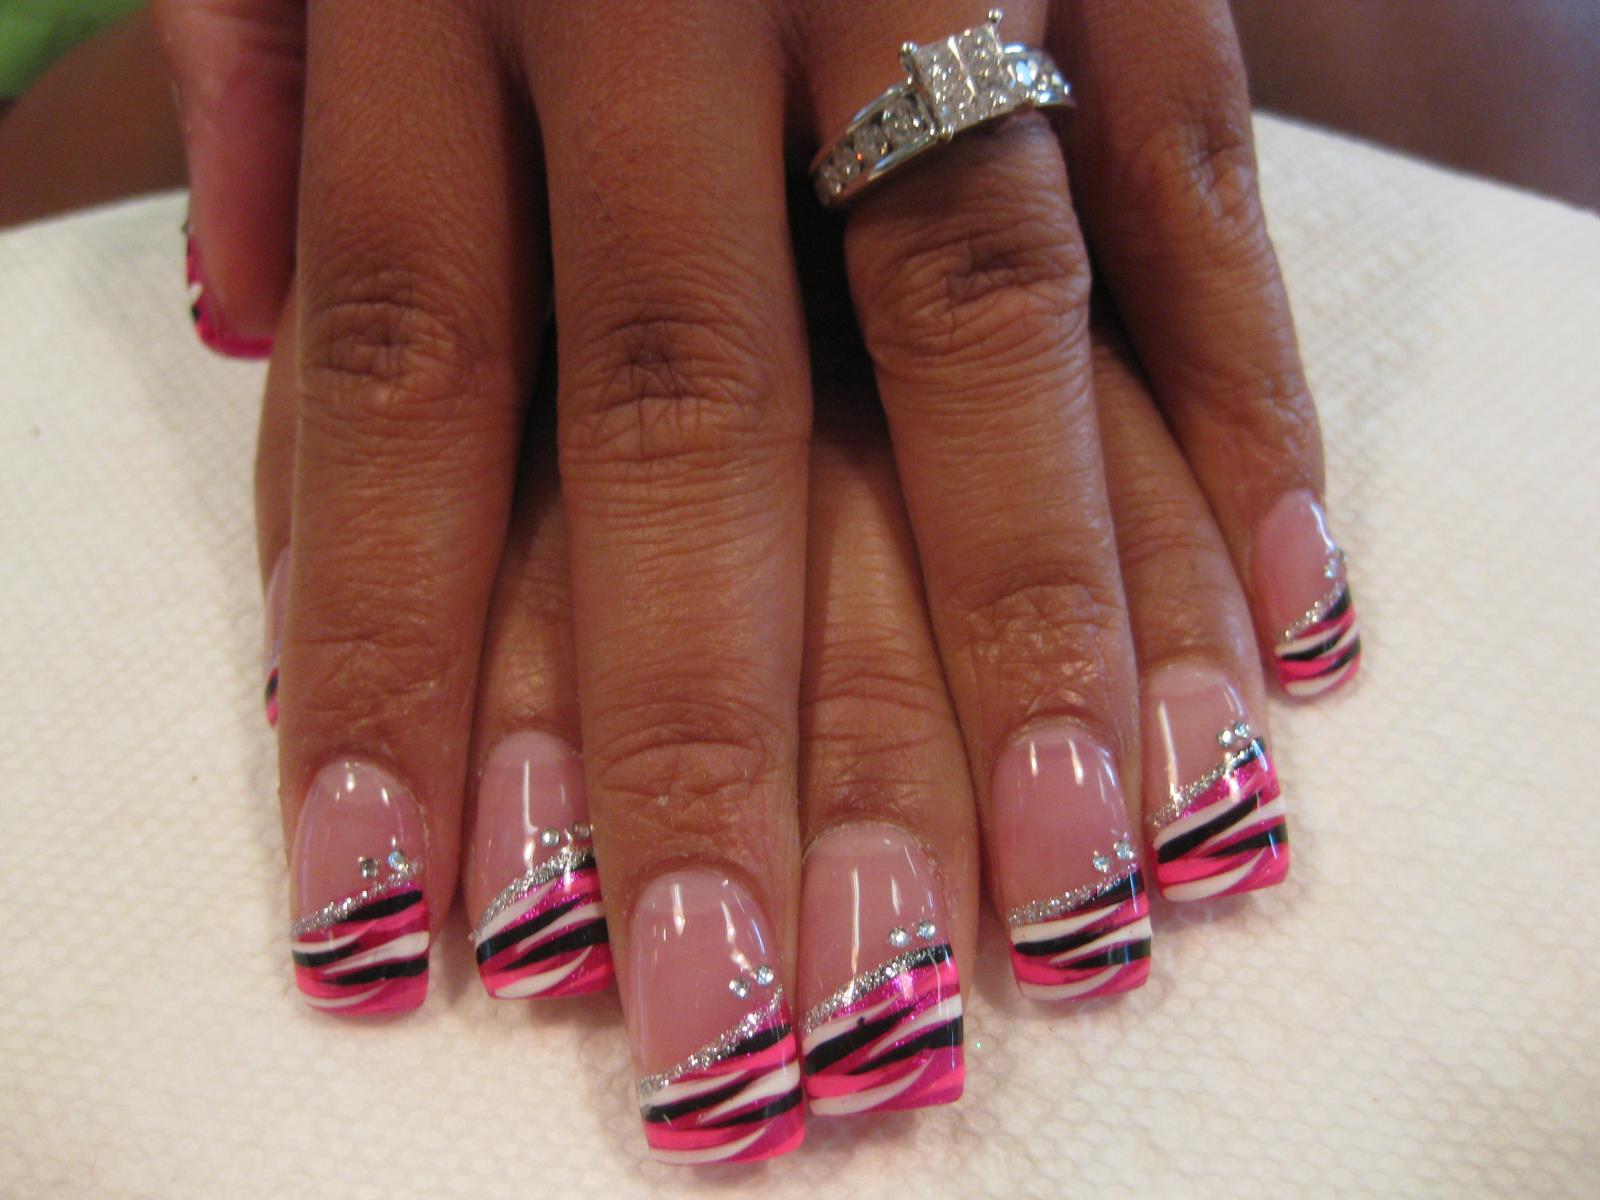 Nail Art Designs Tiger Stripes Papillon Day Spa